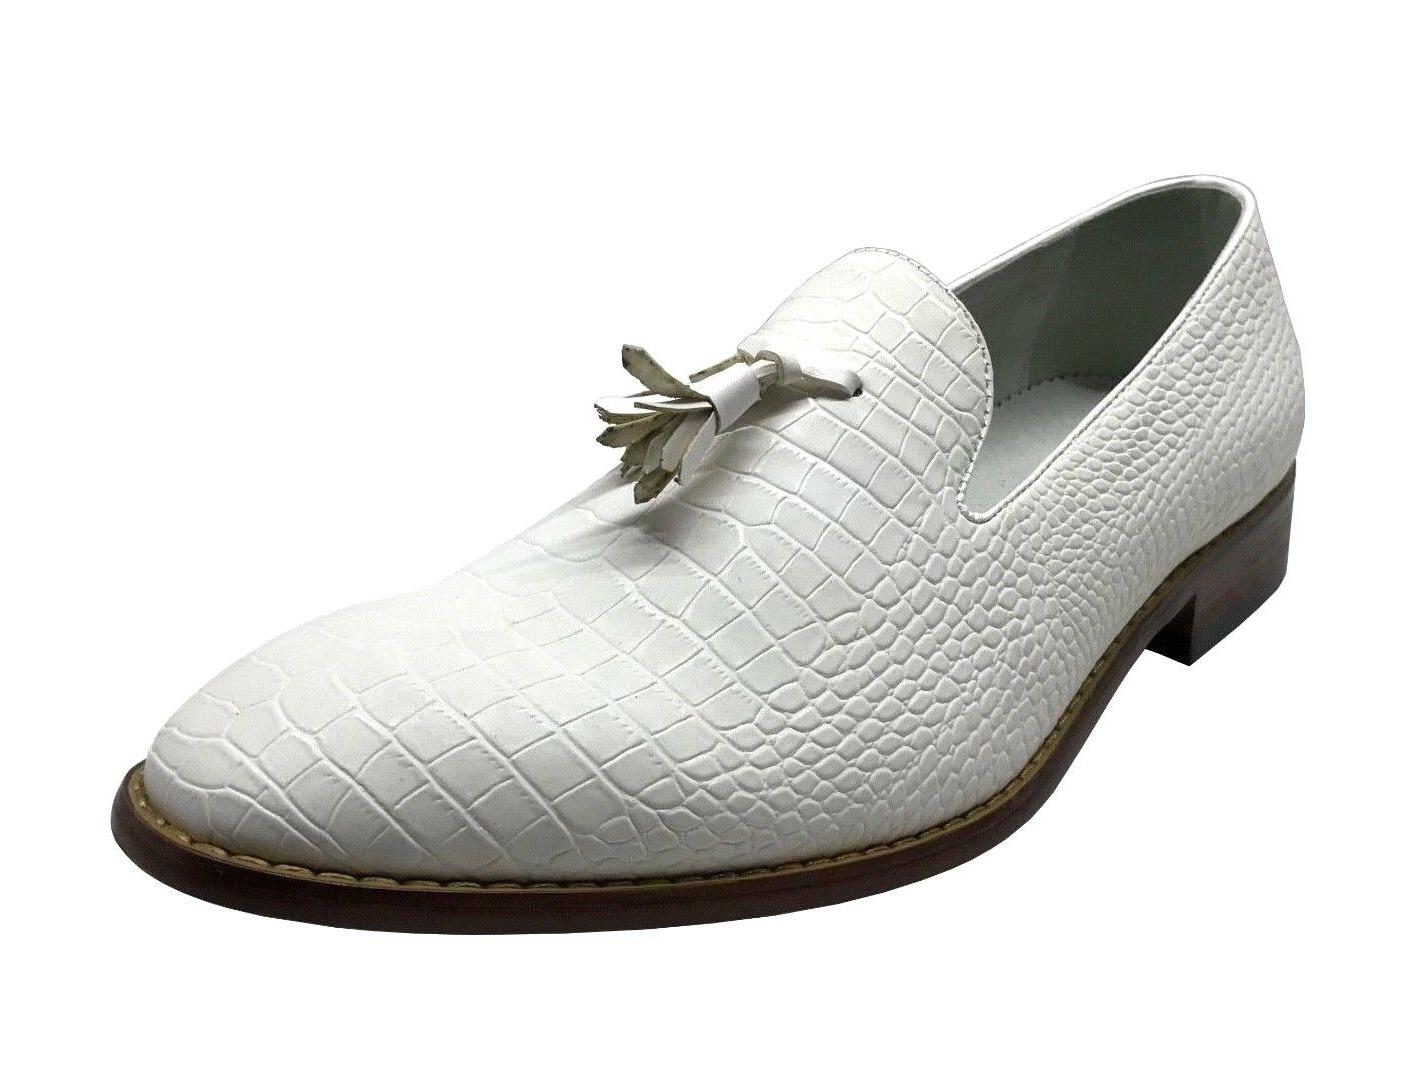 Amali Men's Slip On White Crocodile Print with Tassel Dress